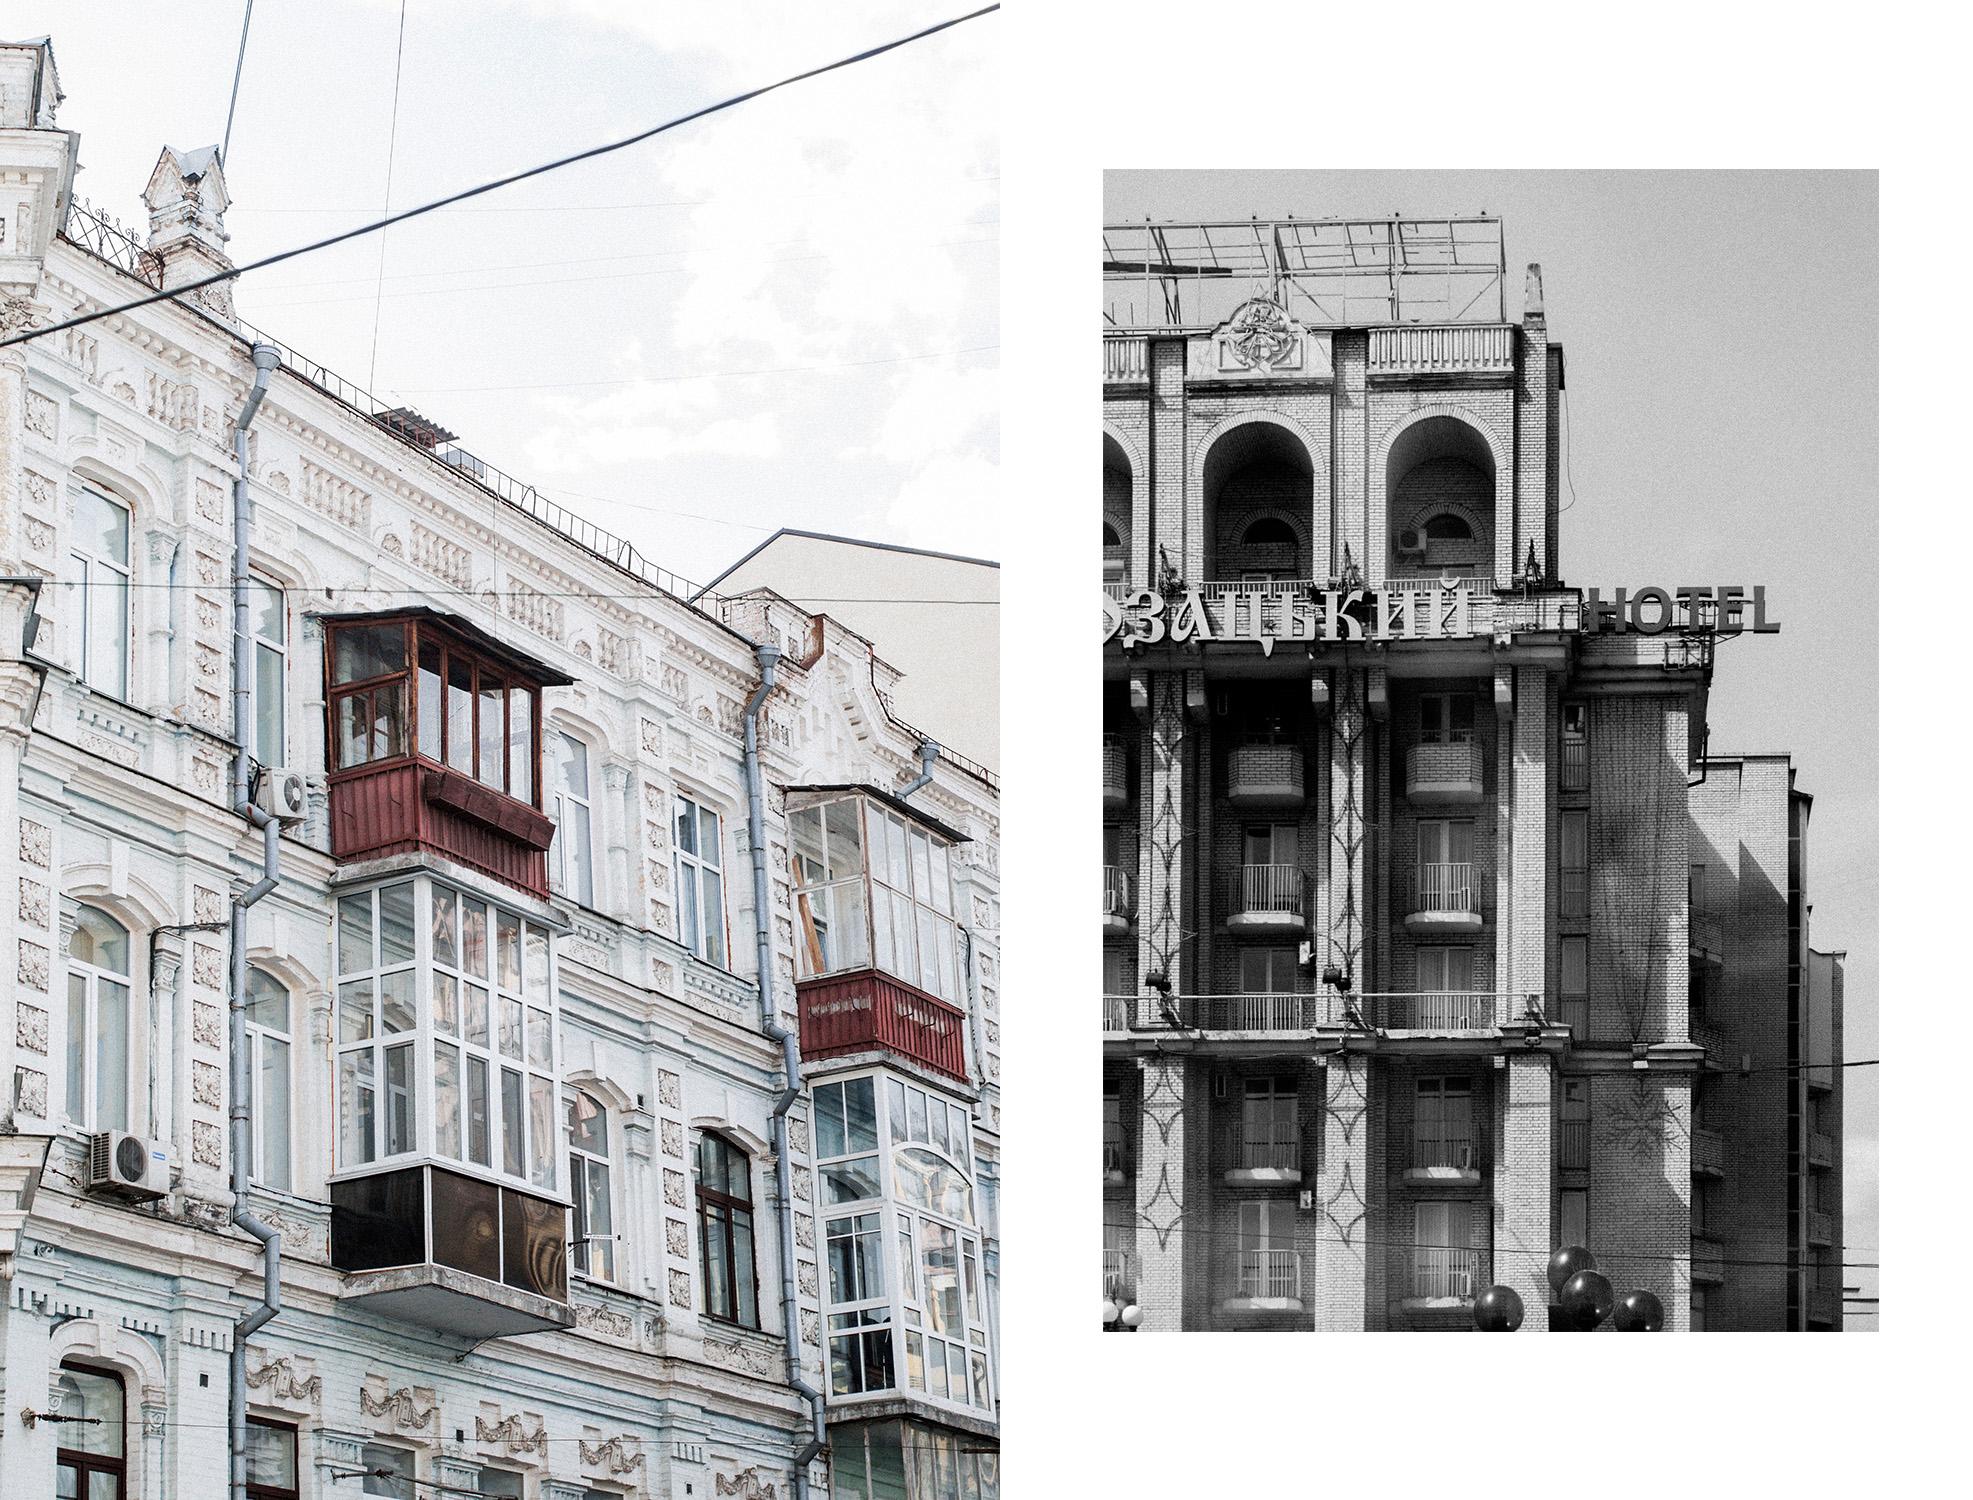 Kyiv's Architecture / Ukraine Travel Diary - IheartAlice.com